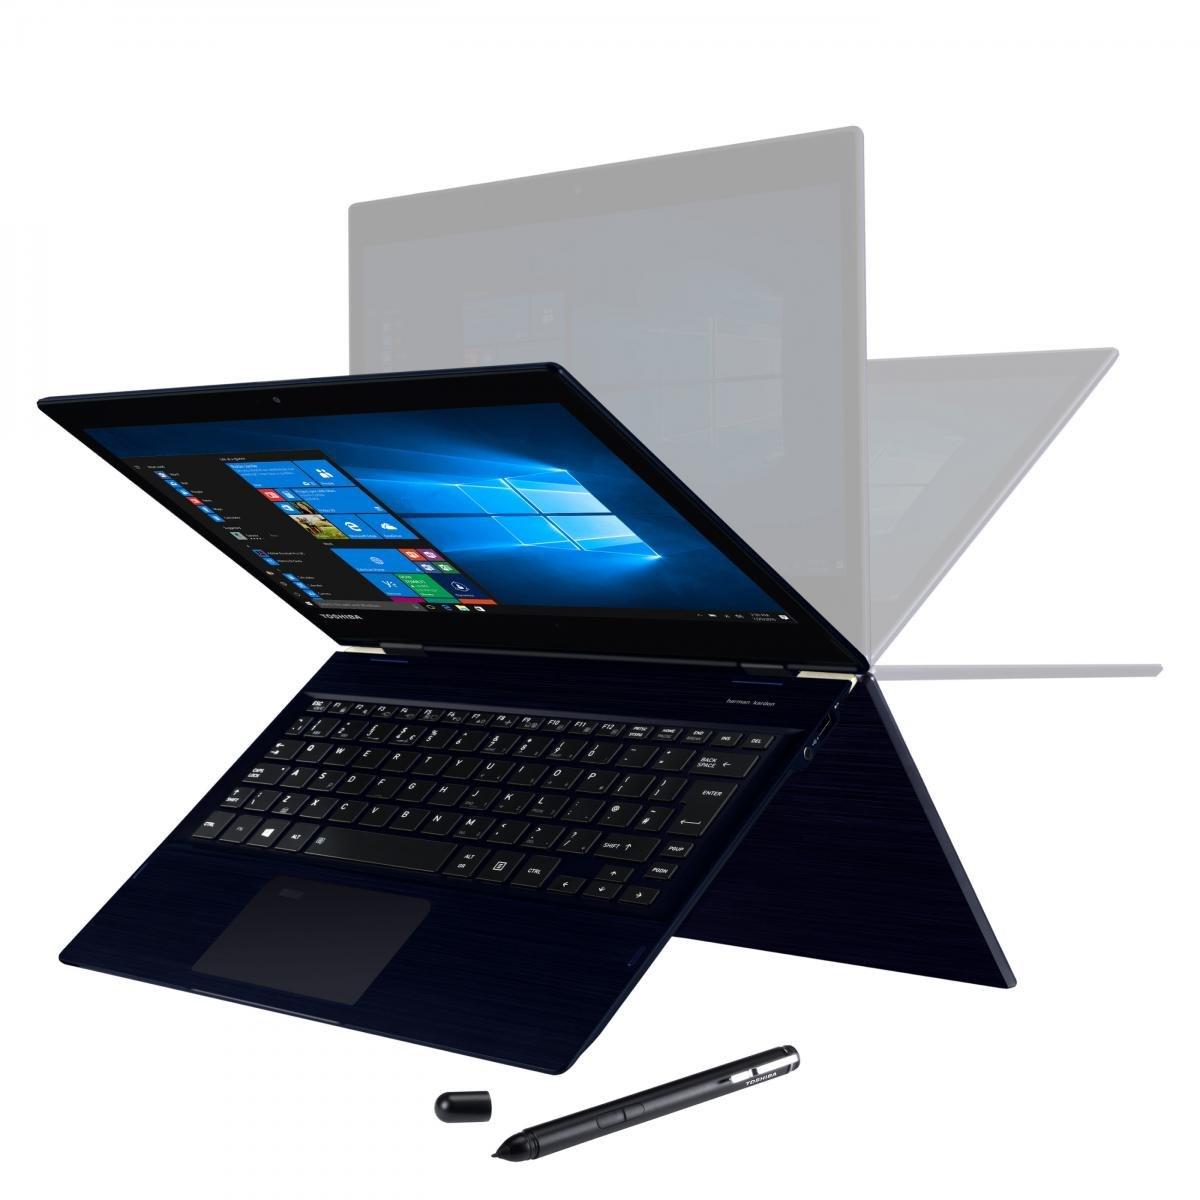 "Toshiba Portege X20W-E 31.8 cm (12.5"") Touchscreen LCD 2 in 1 Notebook - Intel Core i5 (8th Gen) i5-8250U Quad-core (4 Core) 1.60 GHz - 8 GB LPDDR3 - 256 GB SSD - Windows 10 Pro 64-bit - 1920 x 1080 - Convertible - Blue Black Hairline"